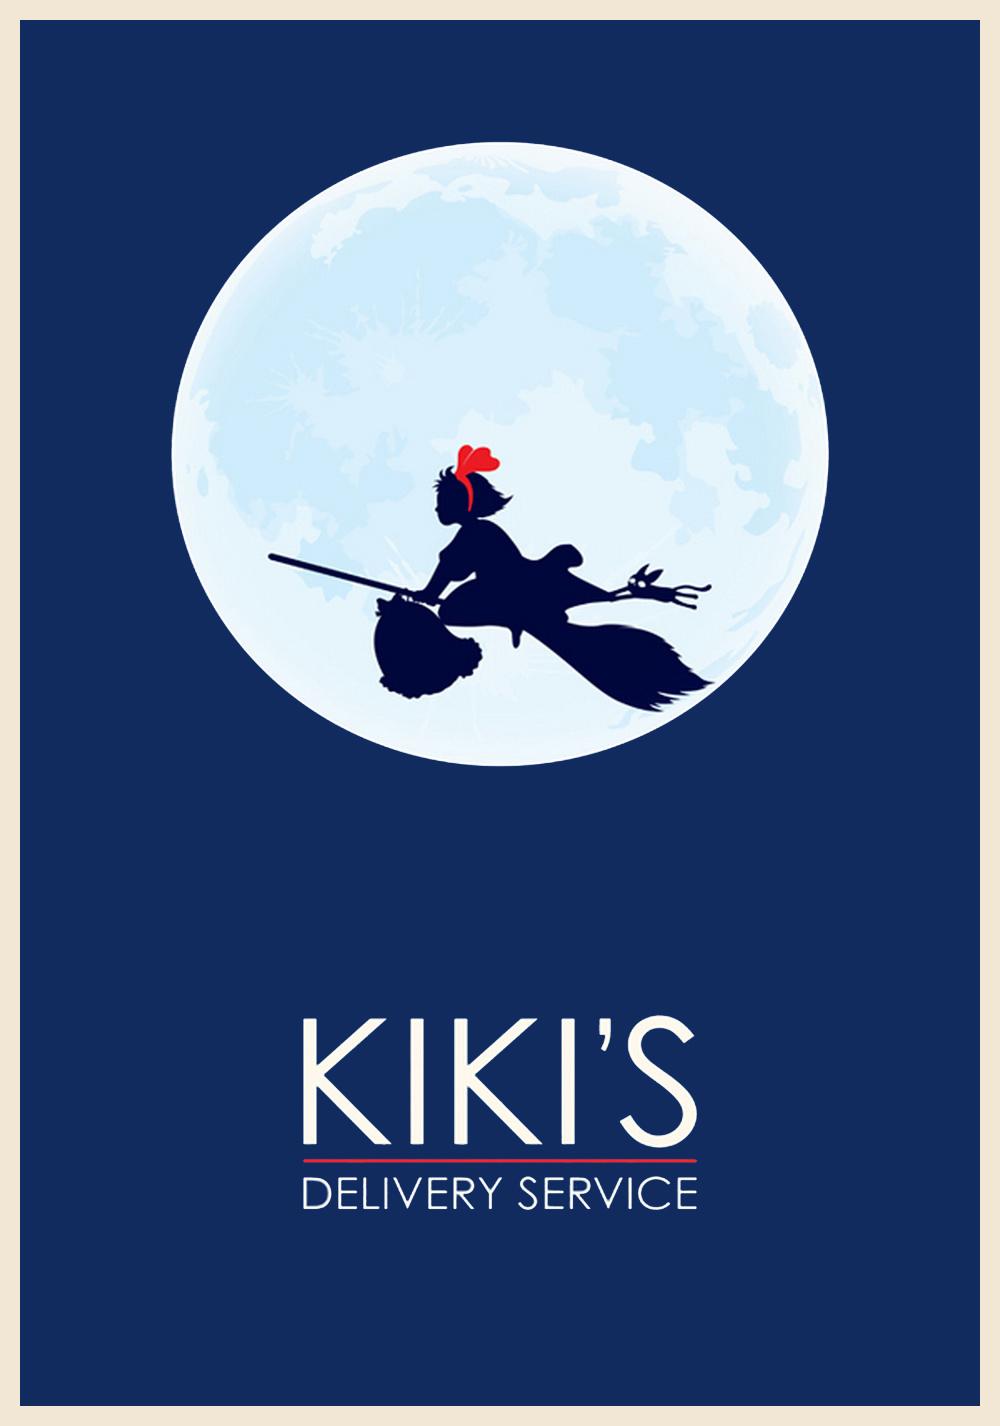 Kikis Delivery Service Sign Kiki 39 s Delivery Service Movie